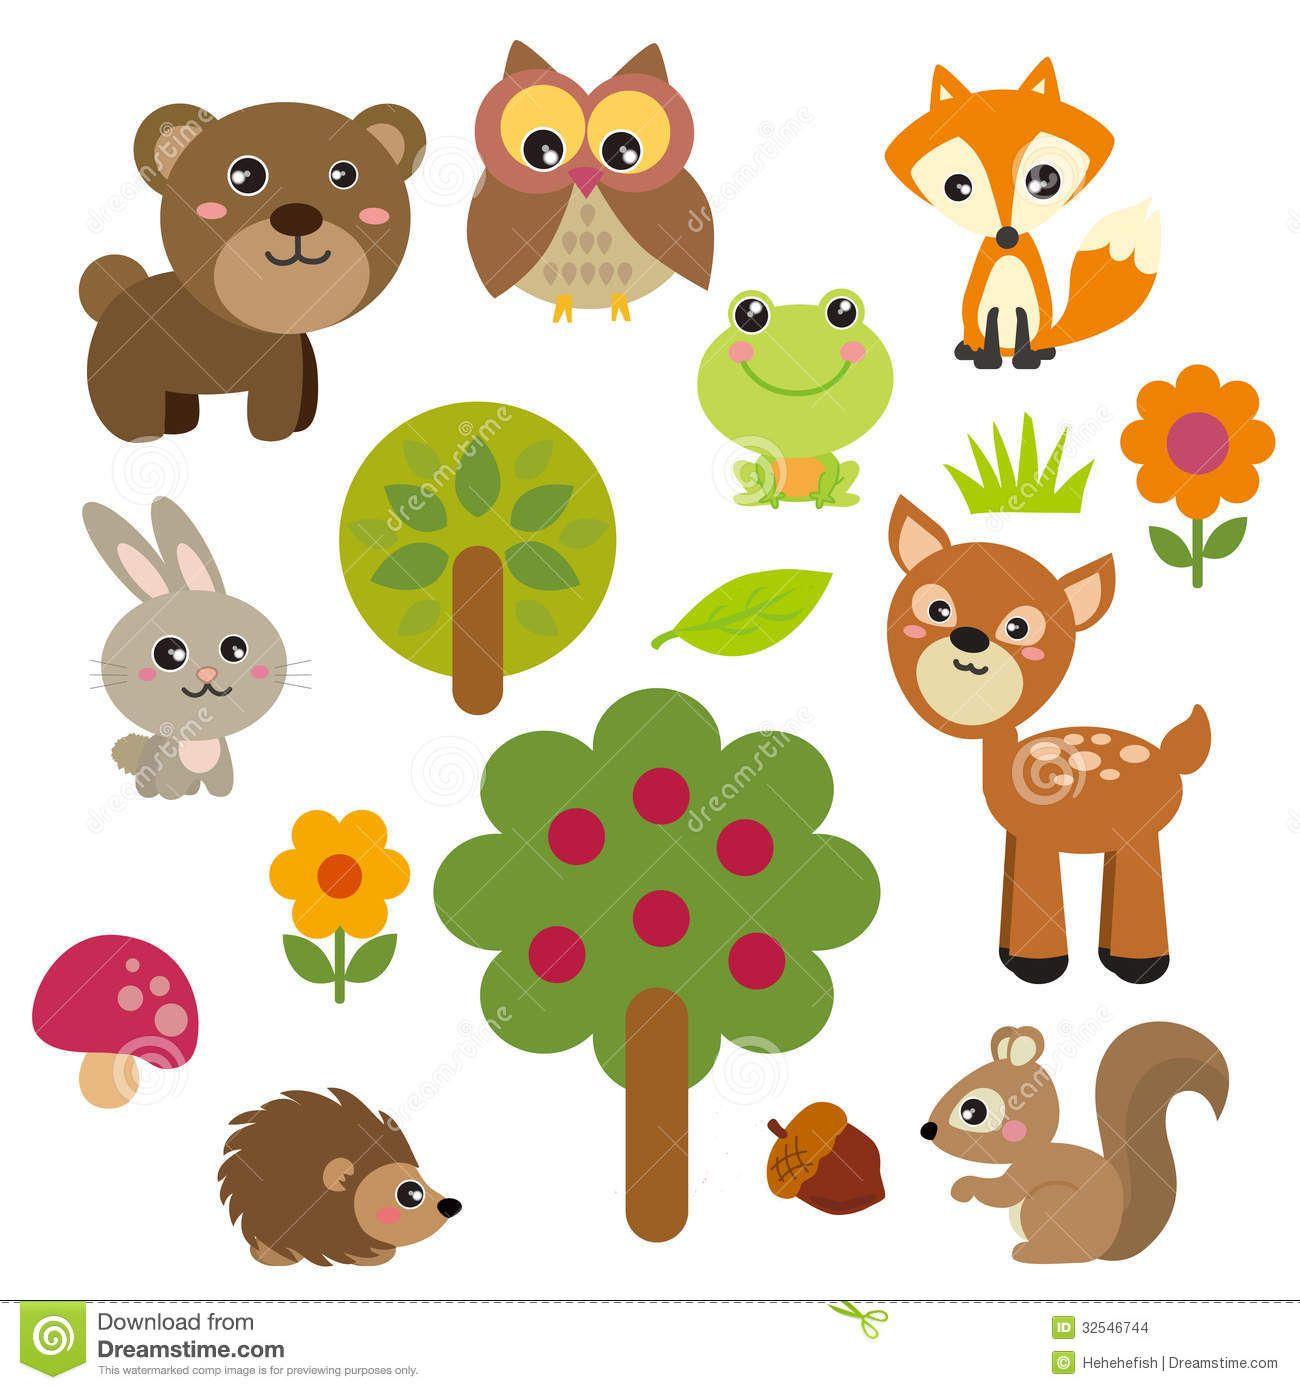 Cute Cartoon Animal Clip Art Realistic Woodland Animals